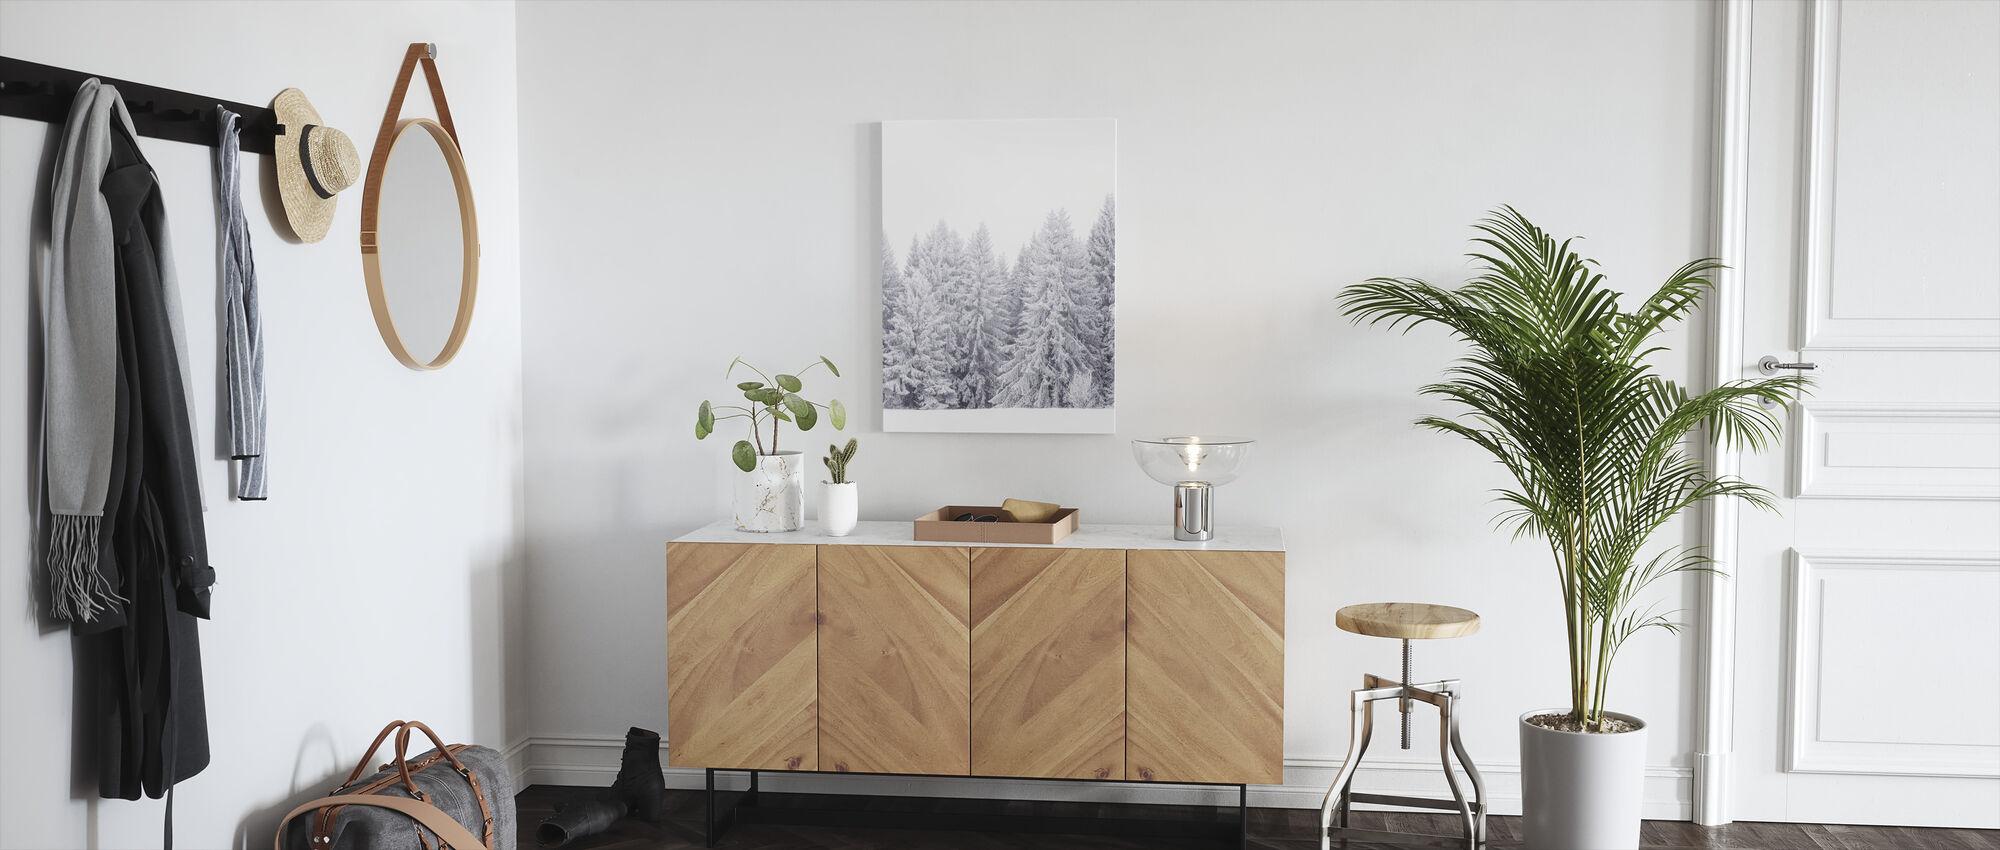 Värmland in White - Canvas print - Hallway